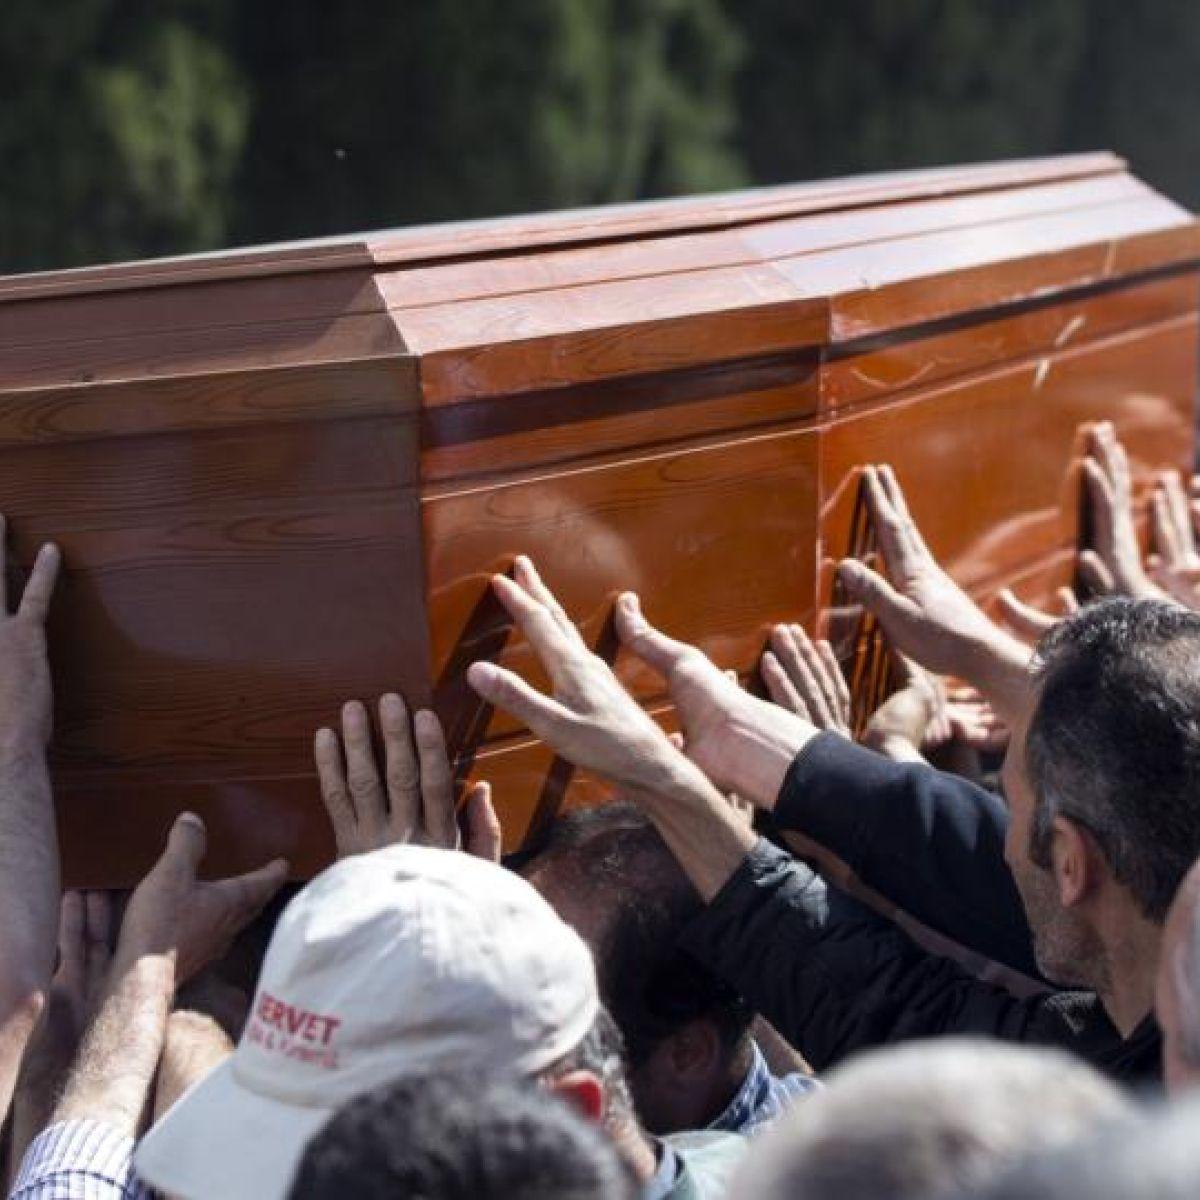 Turkish mine town in 'lockdown' as rescue effort ends